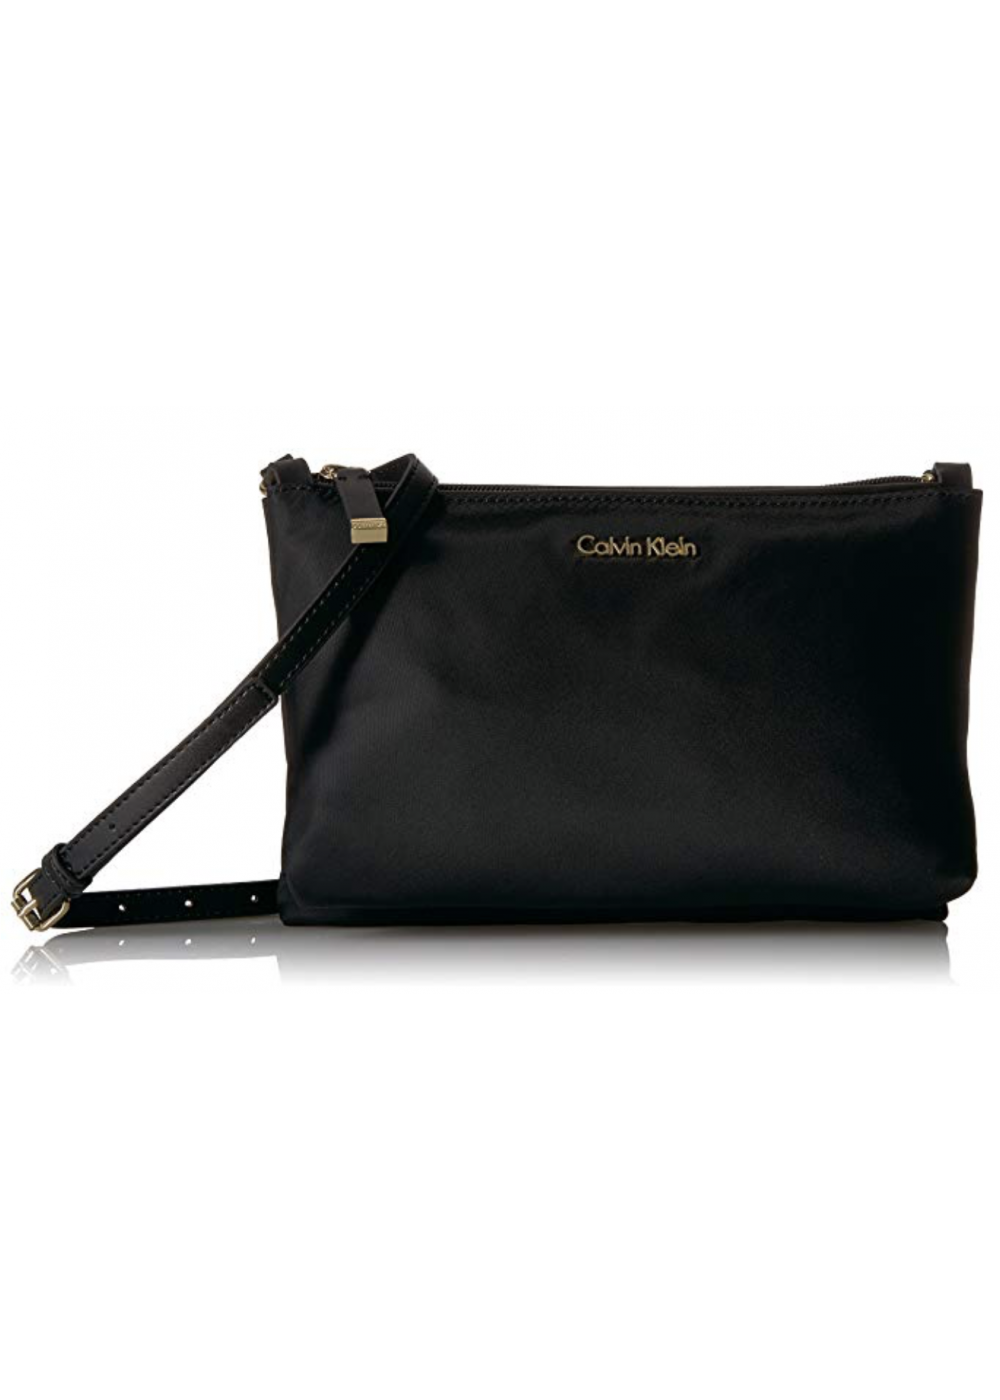 ac28eec5064 Calvin Klein Lucy Nylon Top Zip Crossbody 38$. Tap to expand